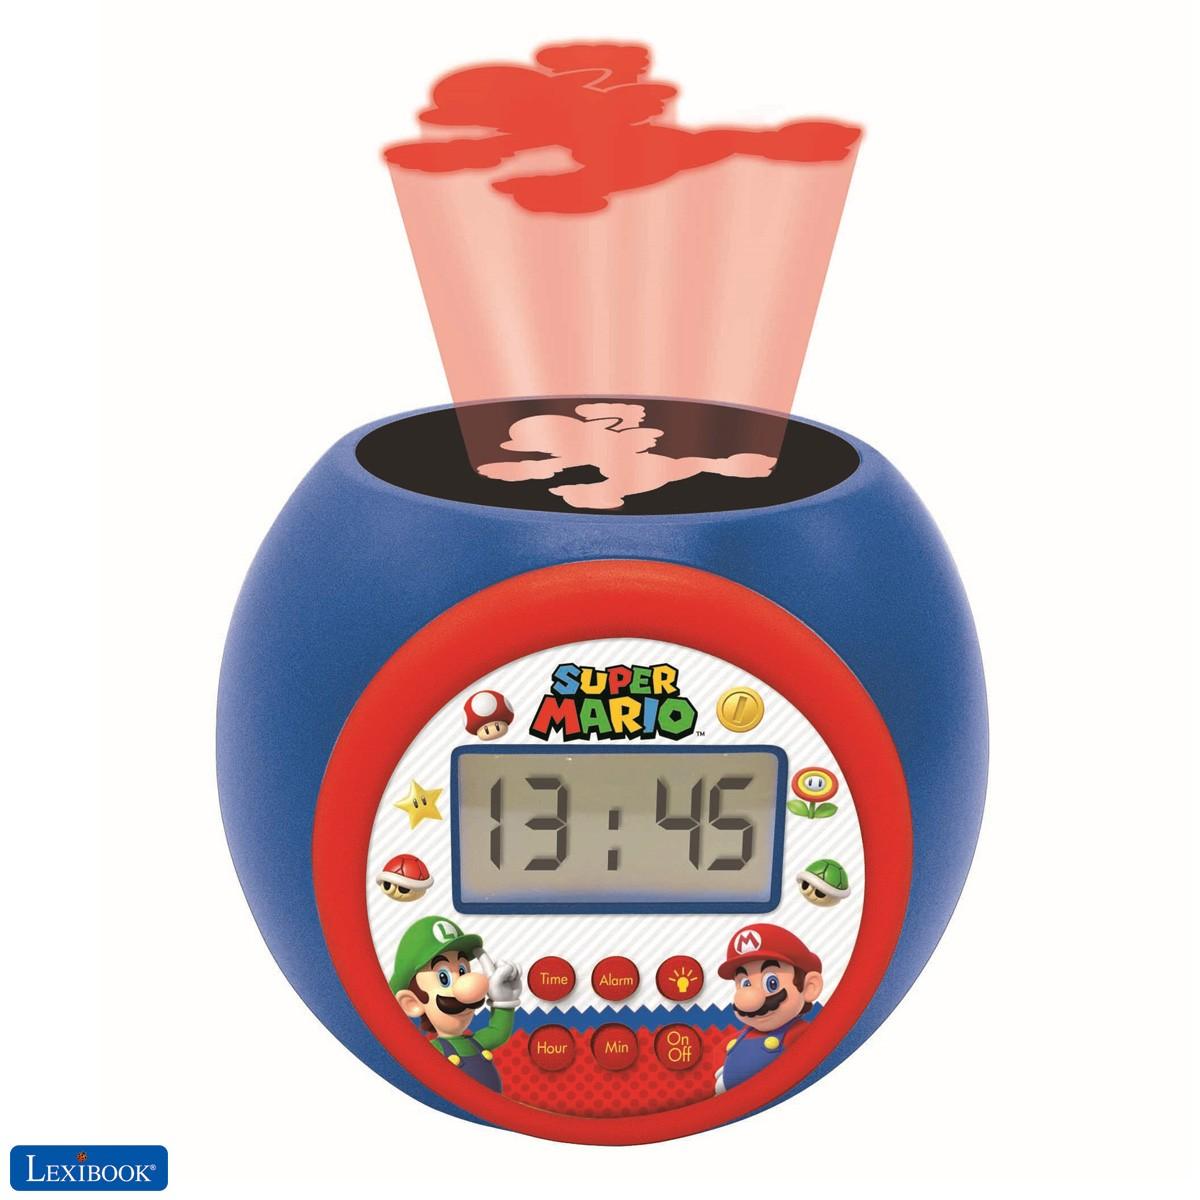 Sveglia con Proiettore Nintendo Super Mario & Luigi